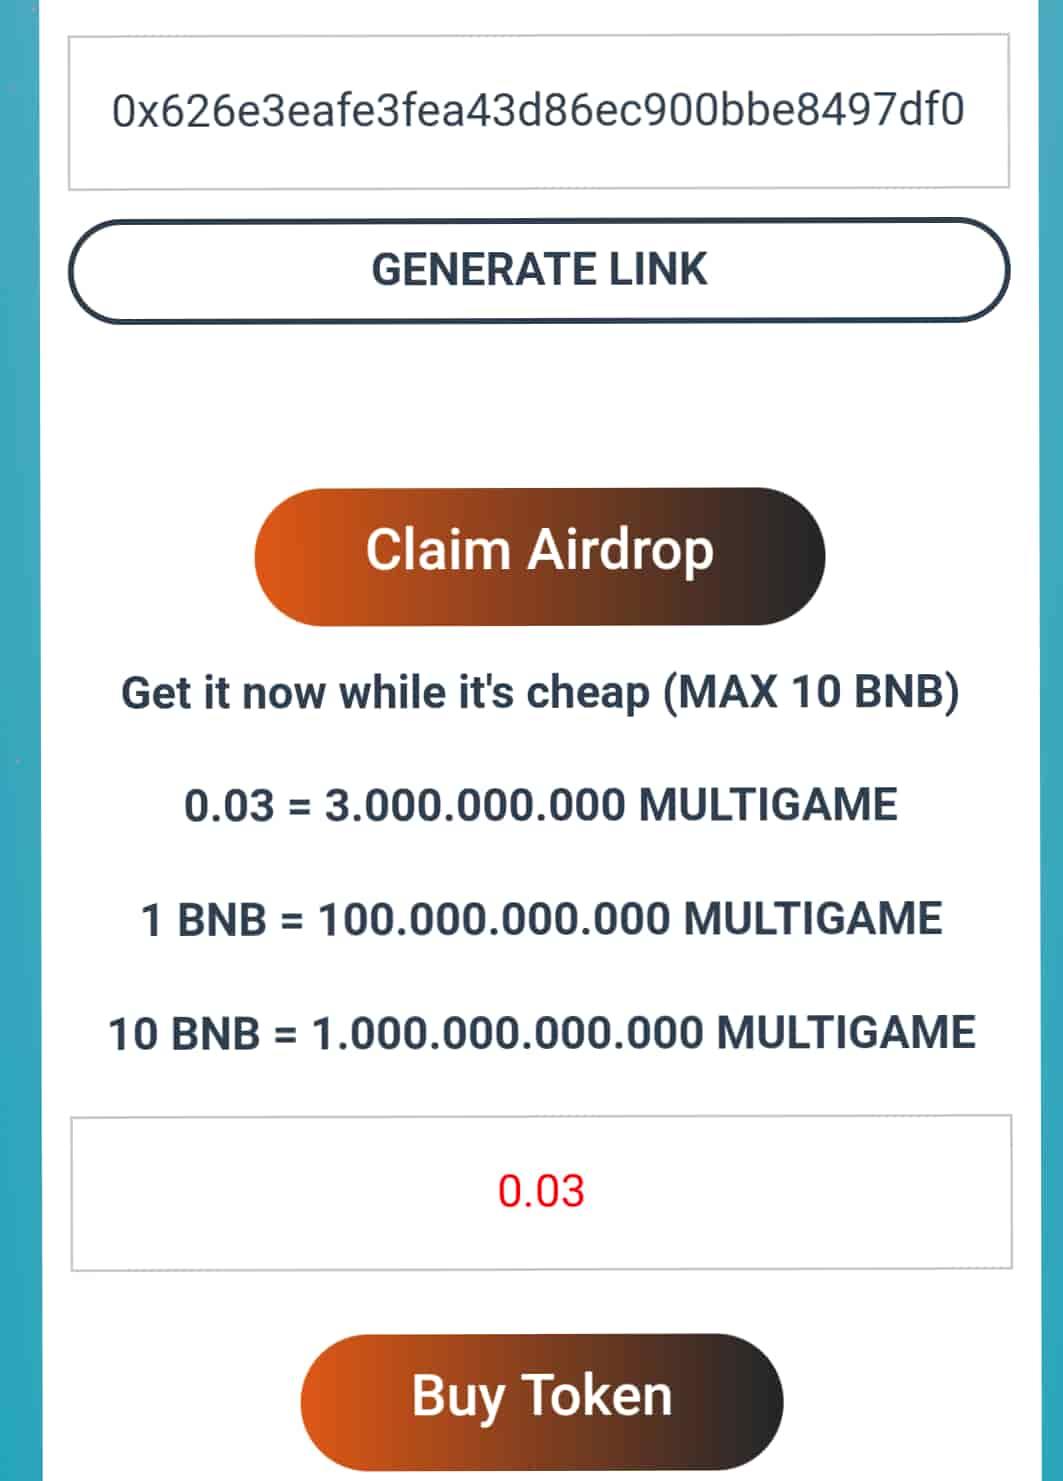 claim-airdrop-multigame